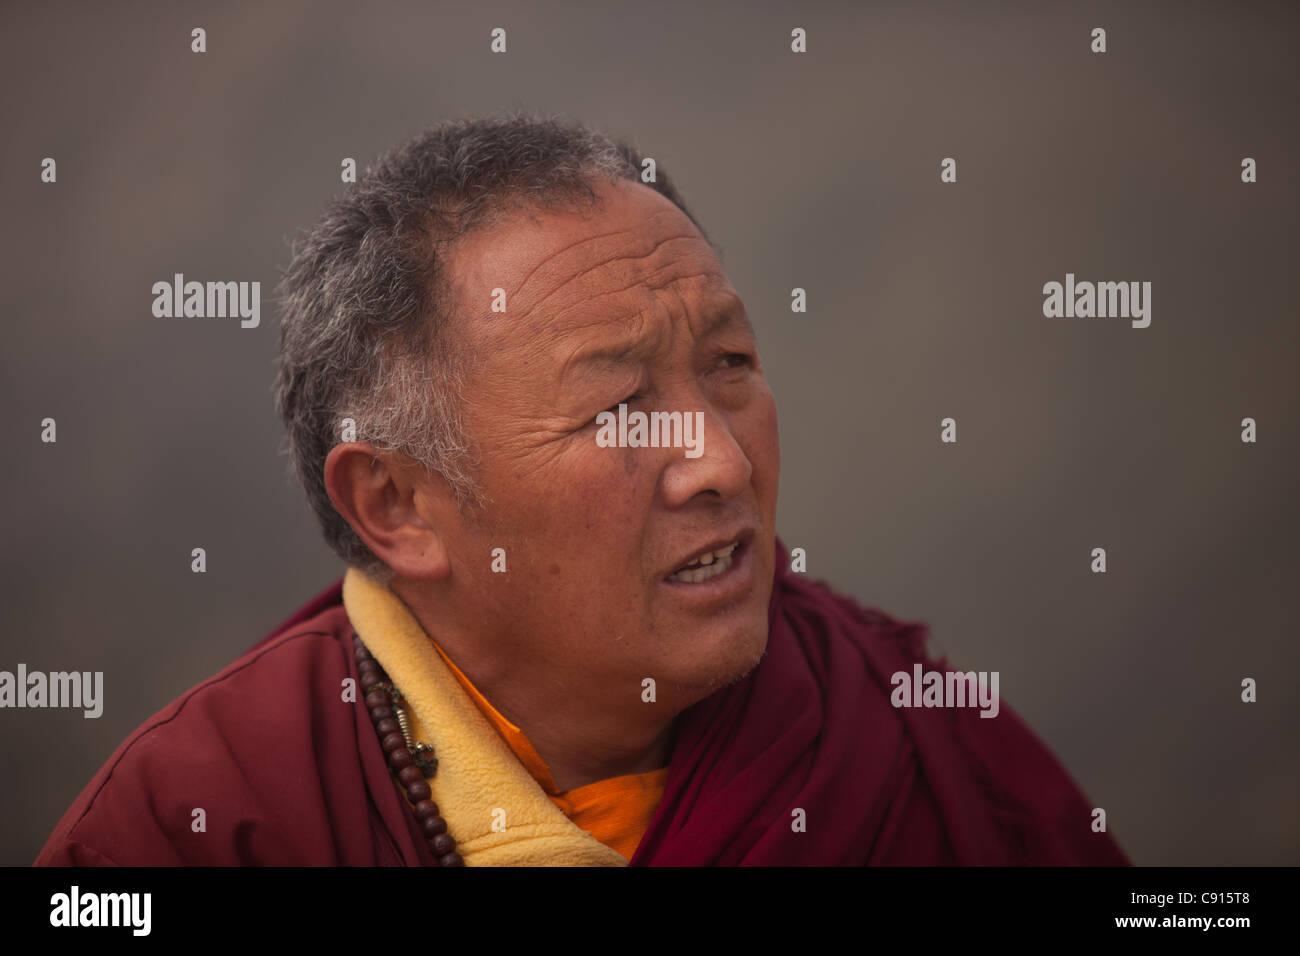 Buddhist priest, Sagarmatha National Park, Nepal - Stock Image